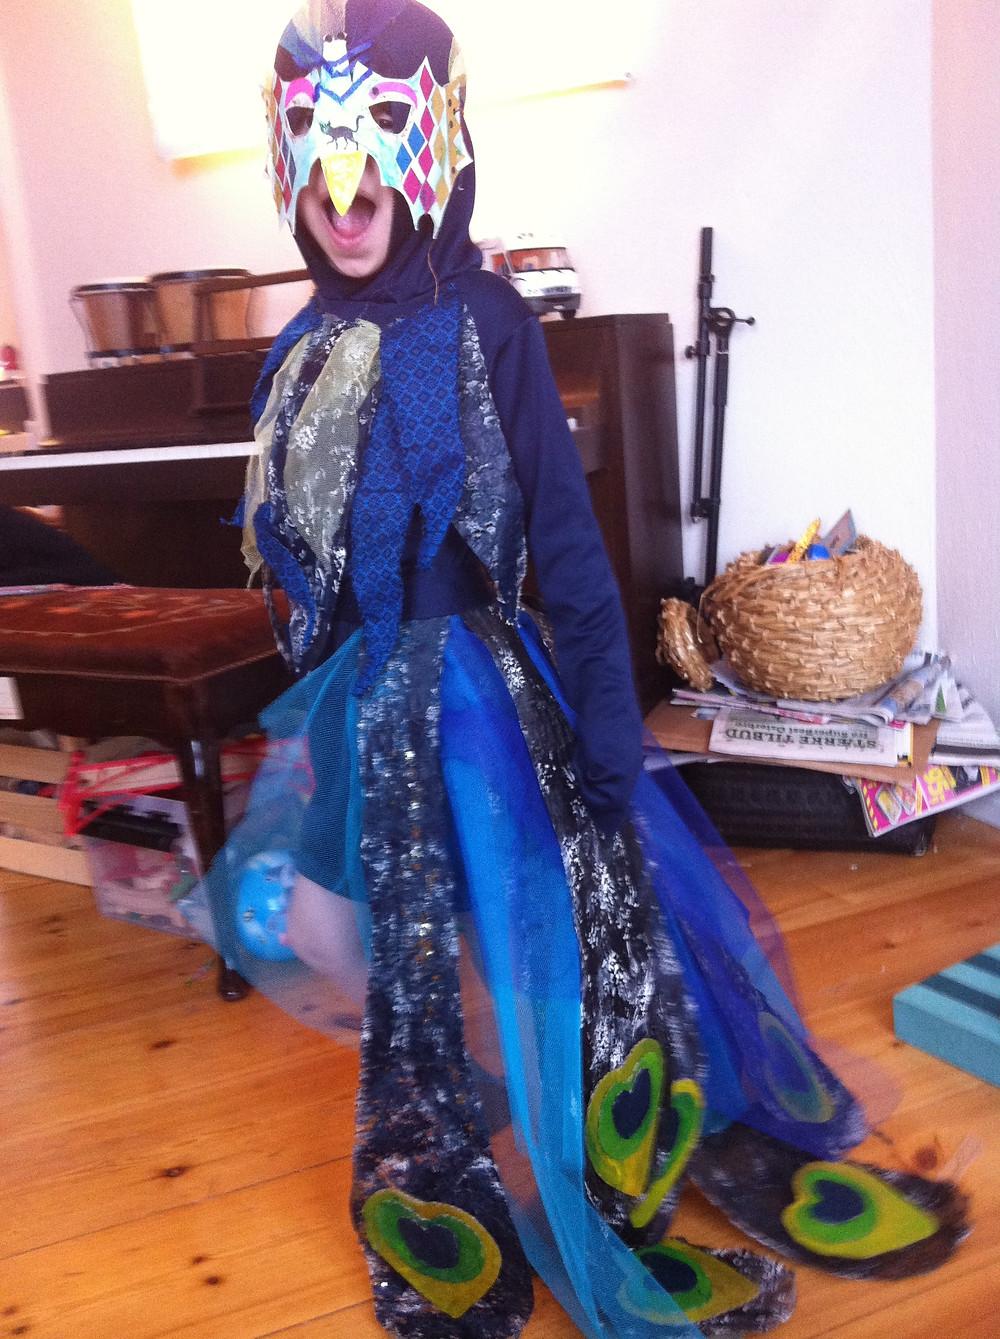 kostume, scenografi